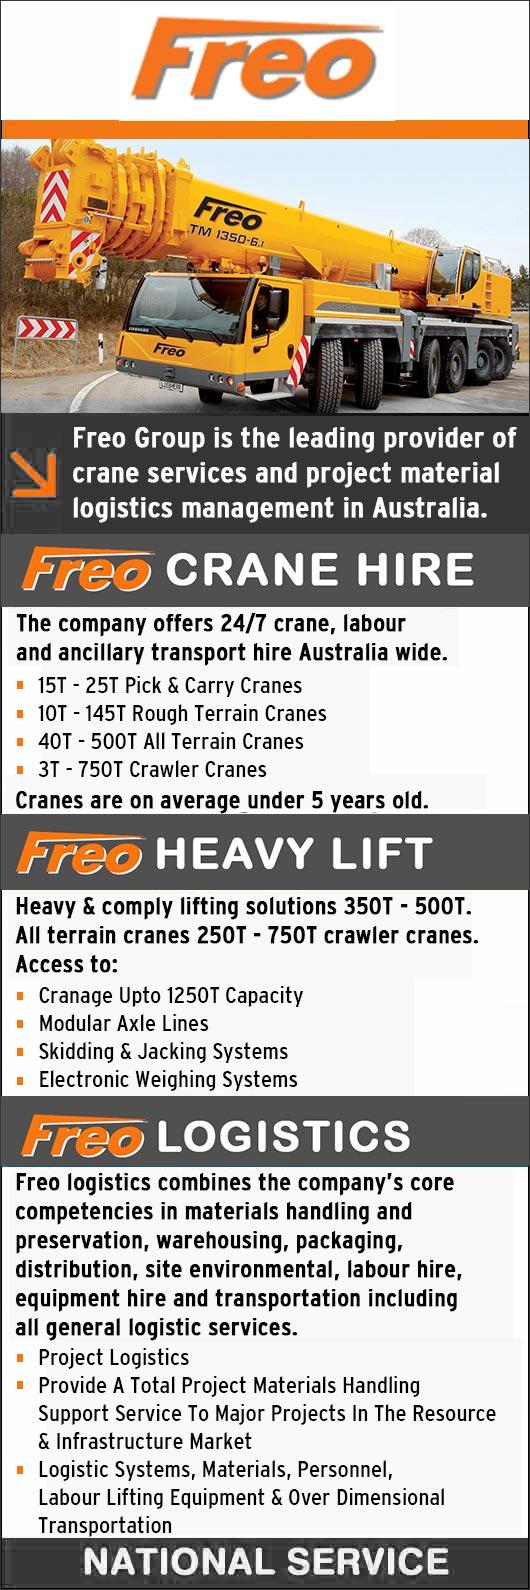 Freo Group Pty Ltd - Crane Hire - Perth